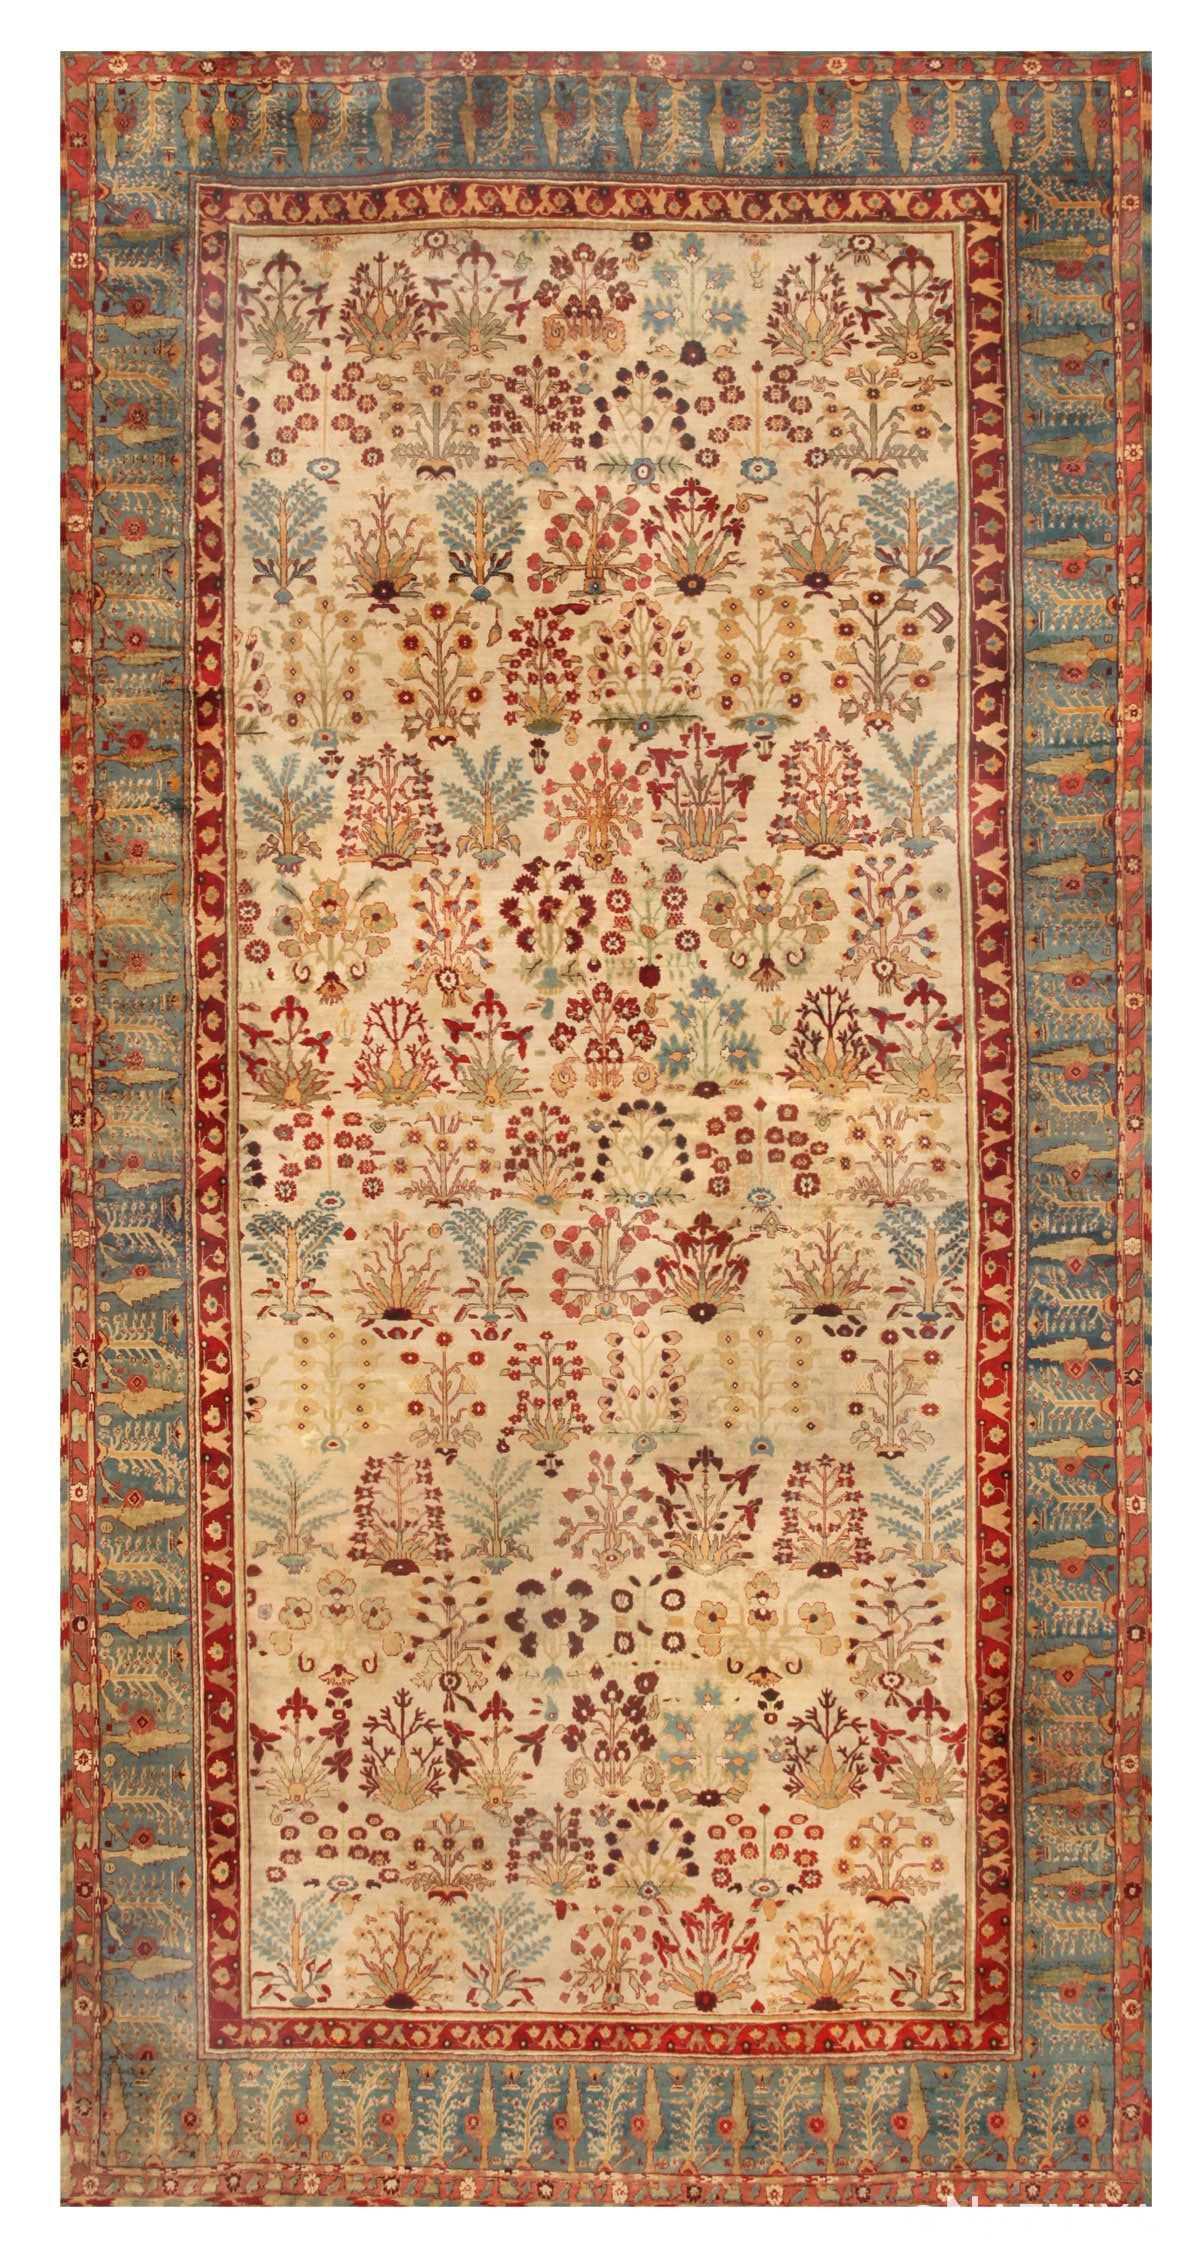 Antique Agra Oriental Rugs 44887 Nazmiyal